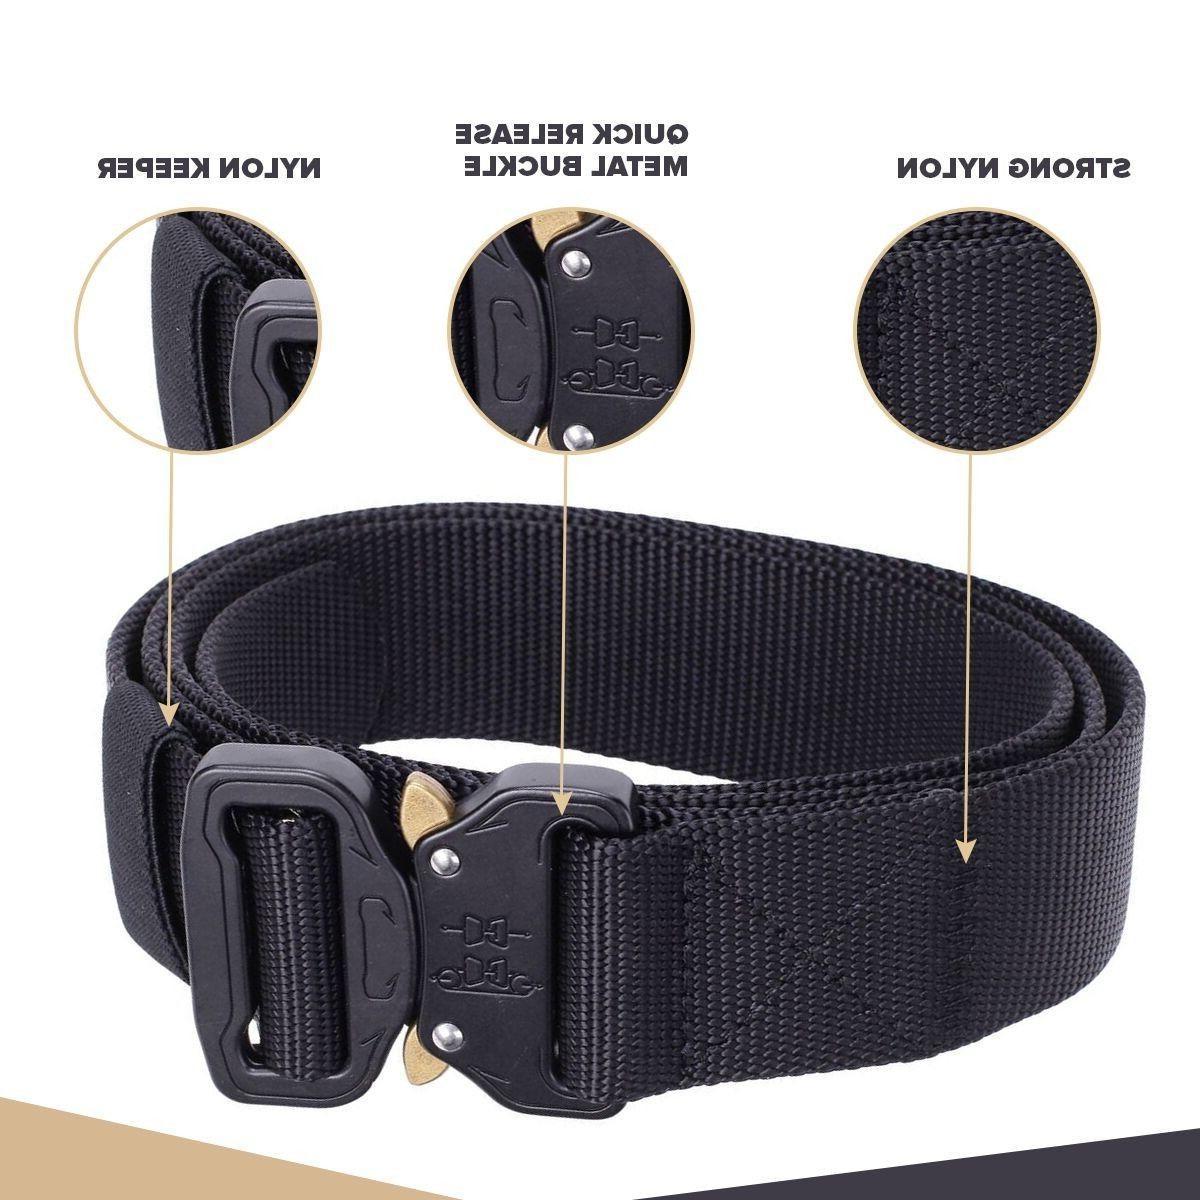 Mens Military Belt Buckle Combat Waistband Adjustable